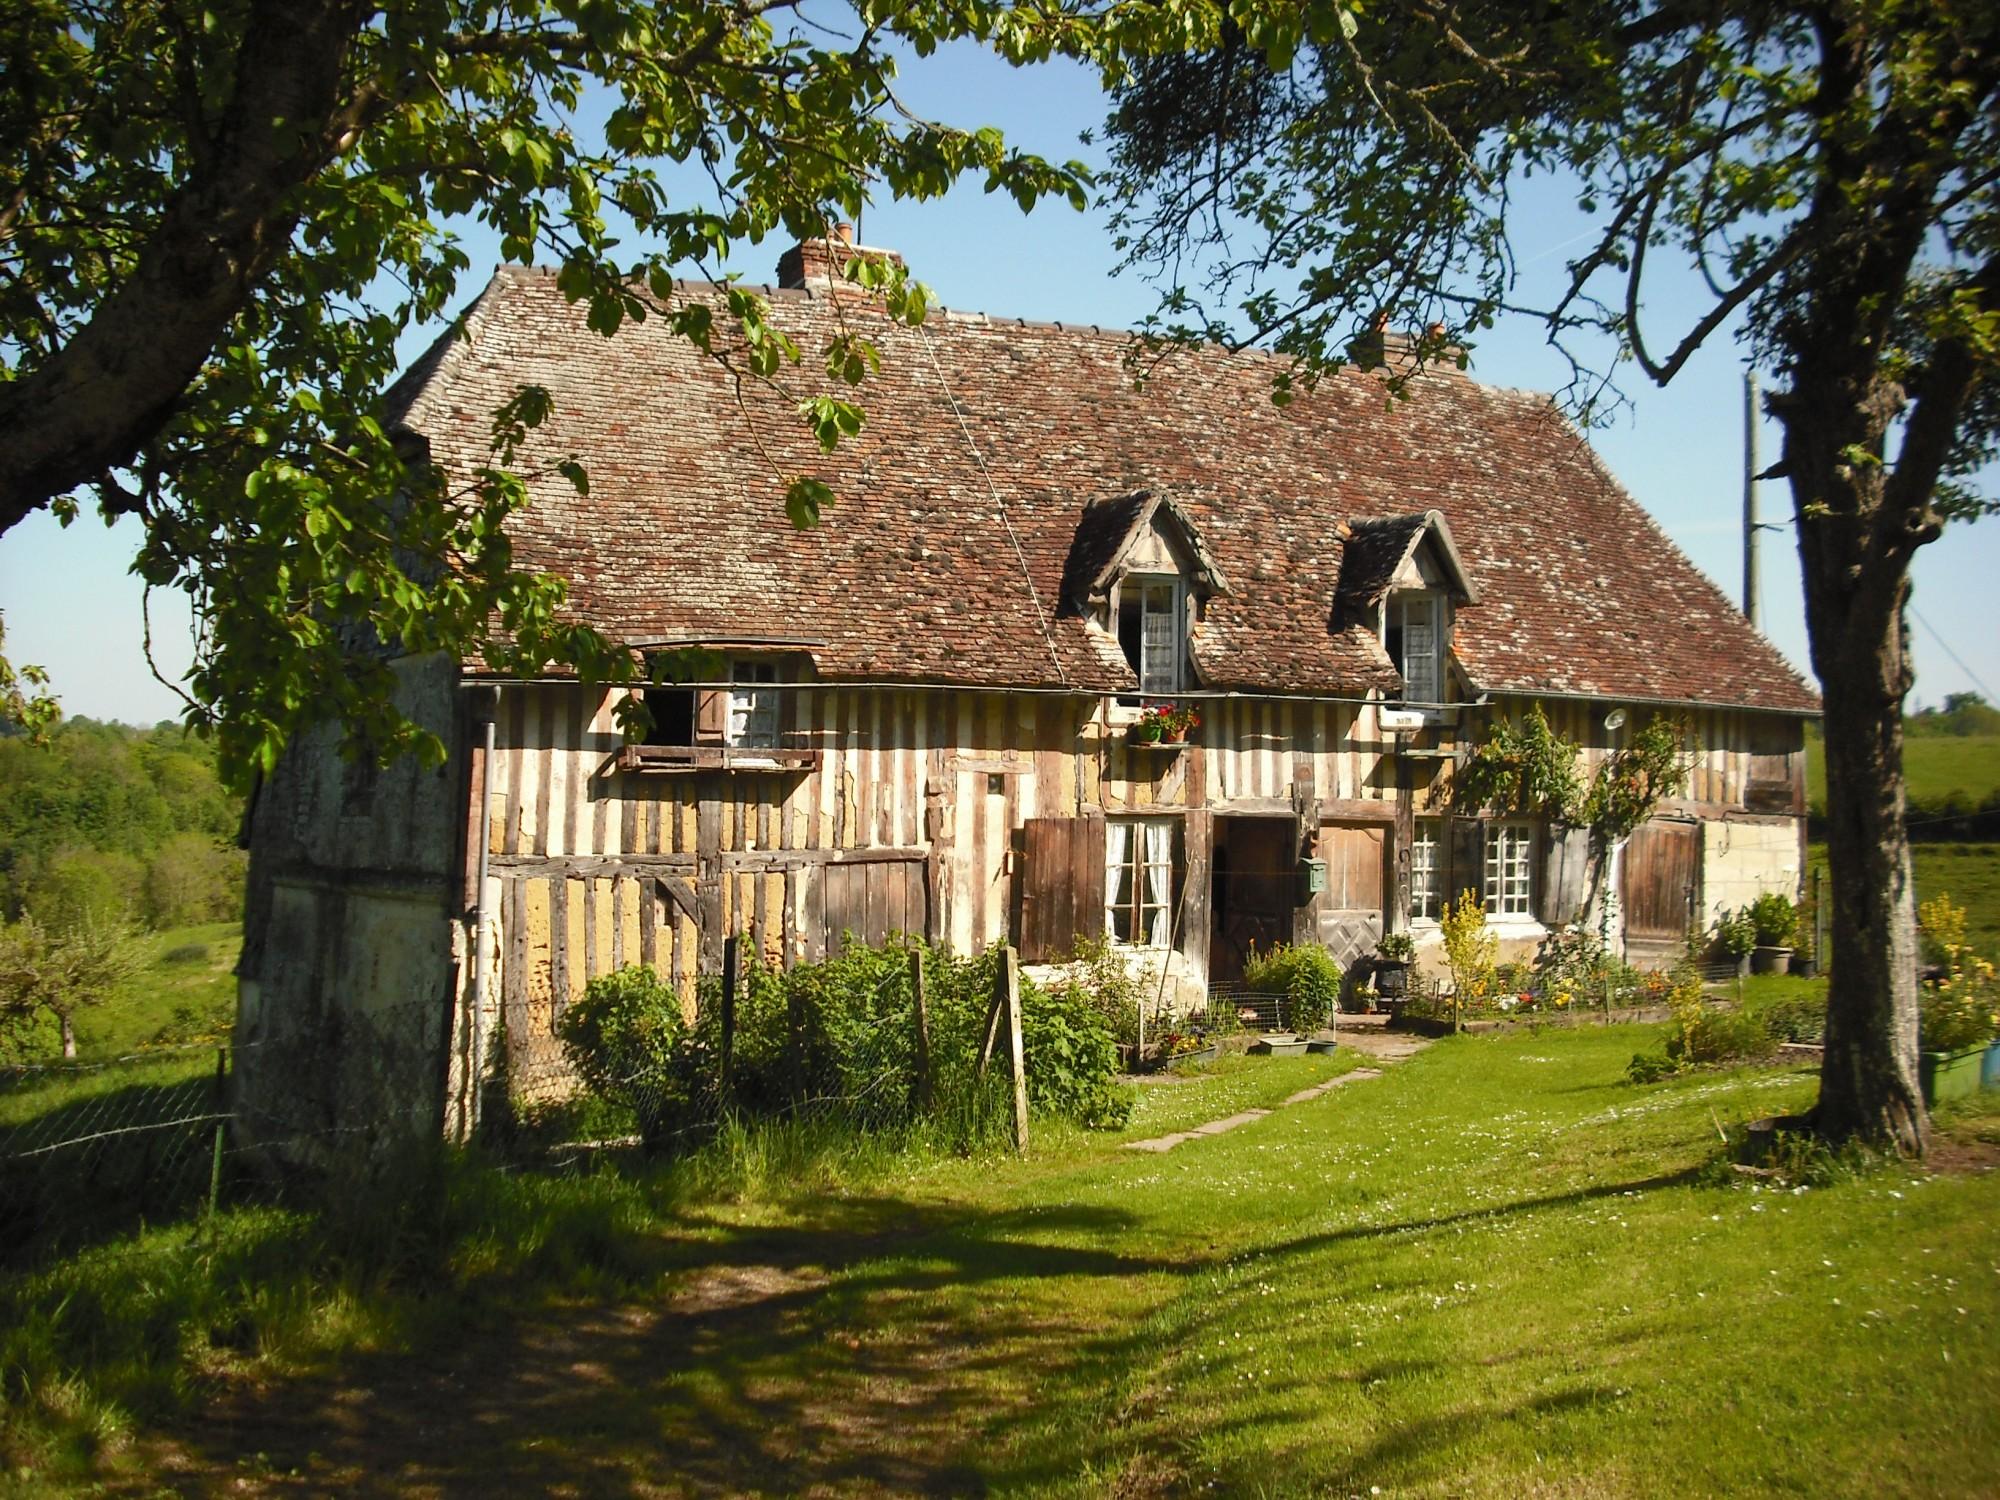 maison normande lisieux normandie calvados 14 terres et demeures de normandie. Black Bedroom Furniture Sets. Home Design Ideas